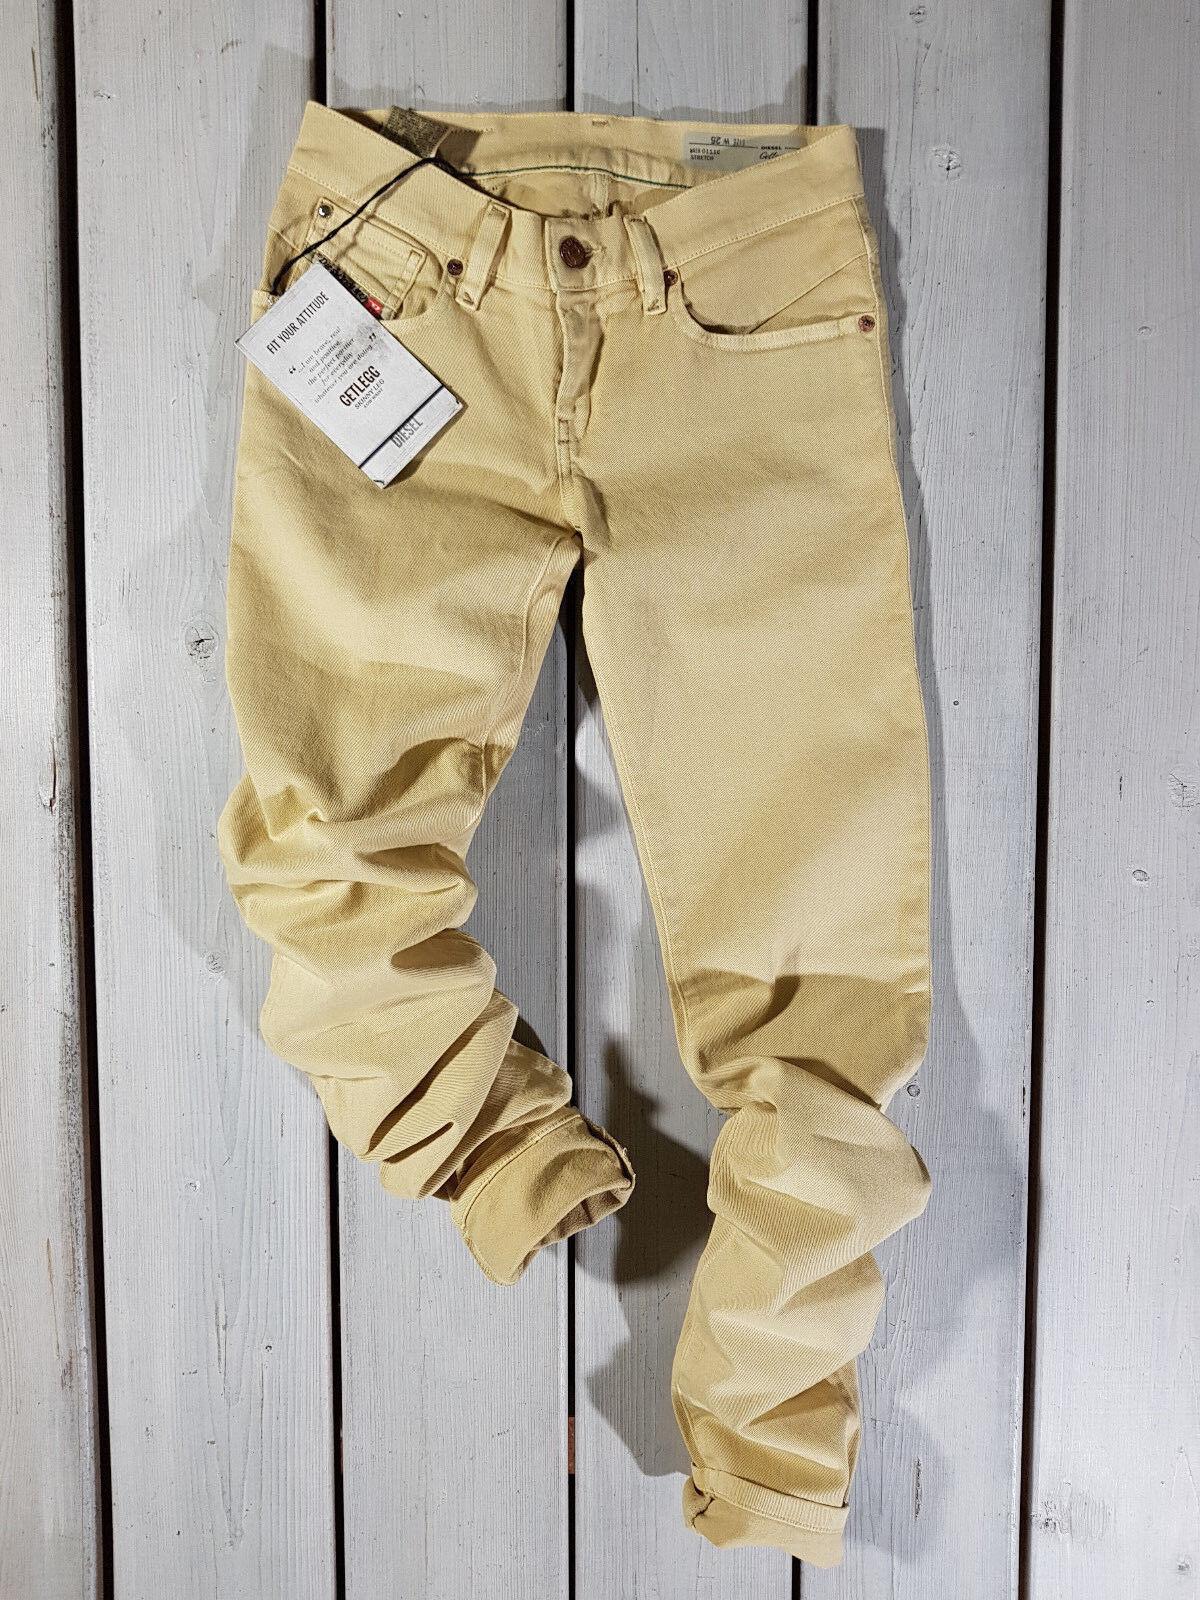 Neu Diesel DAMEN Jeans W25 Getlegg 0111c Enganliegend Niedrige Größe Gelb